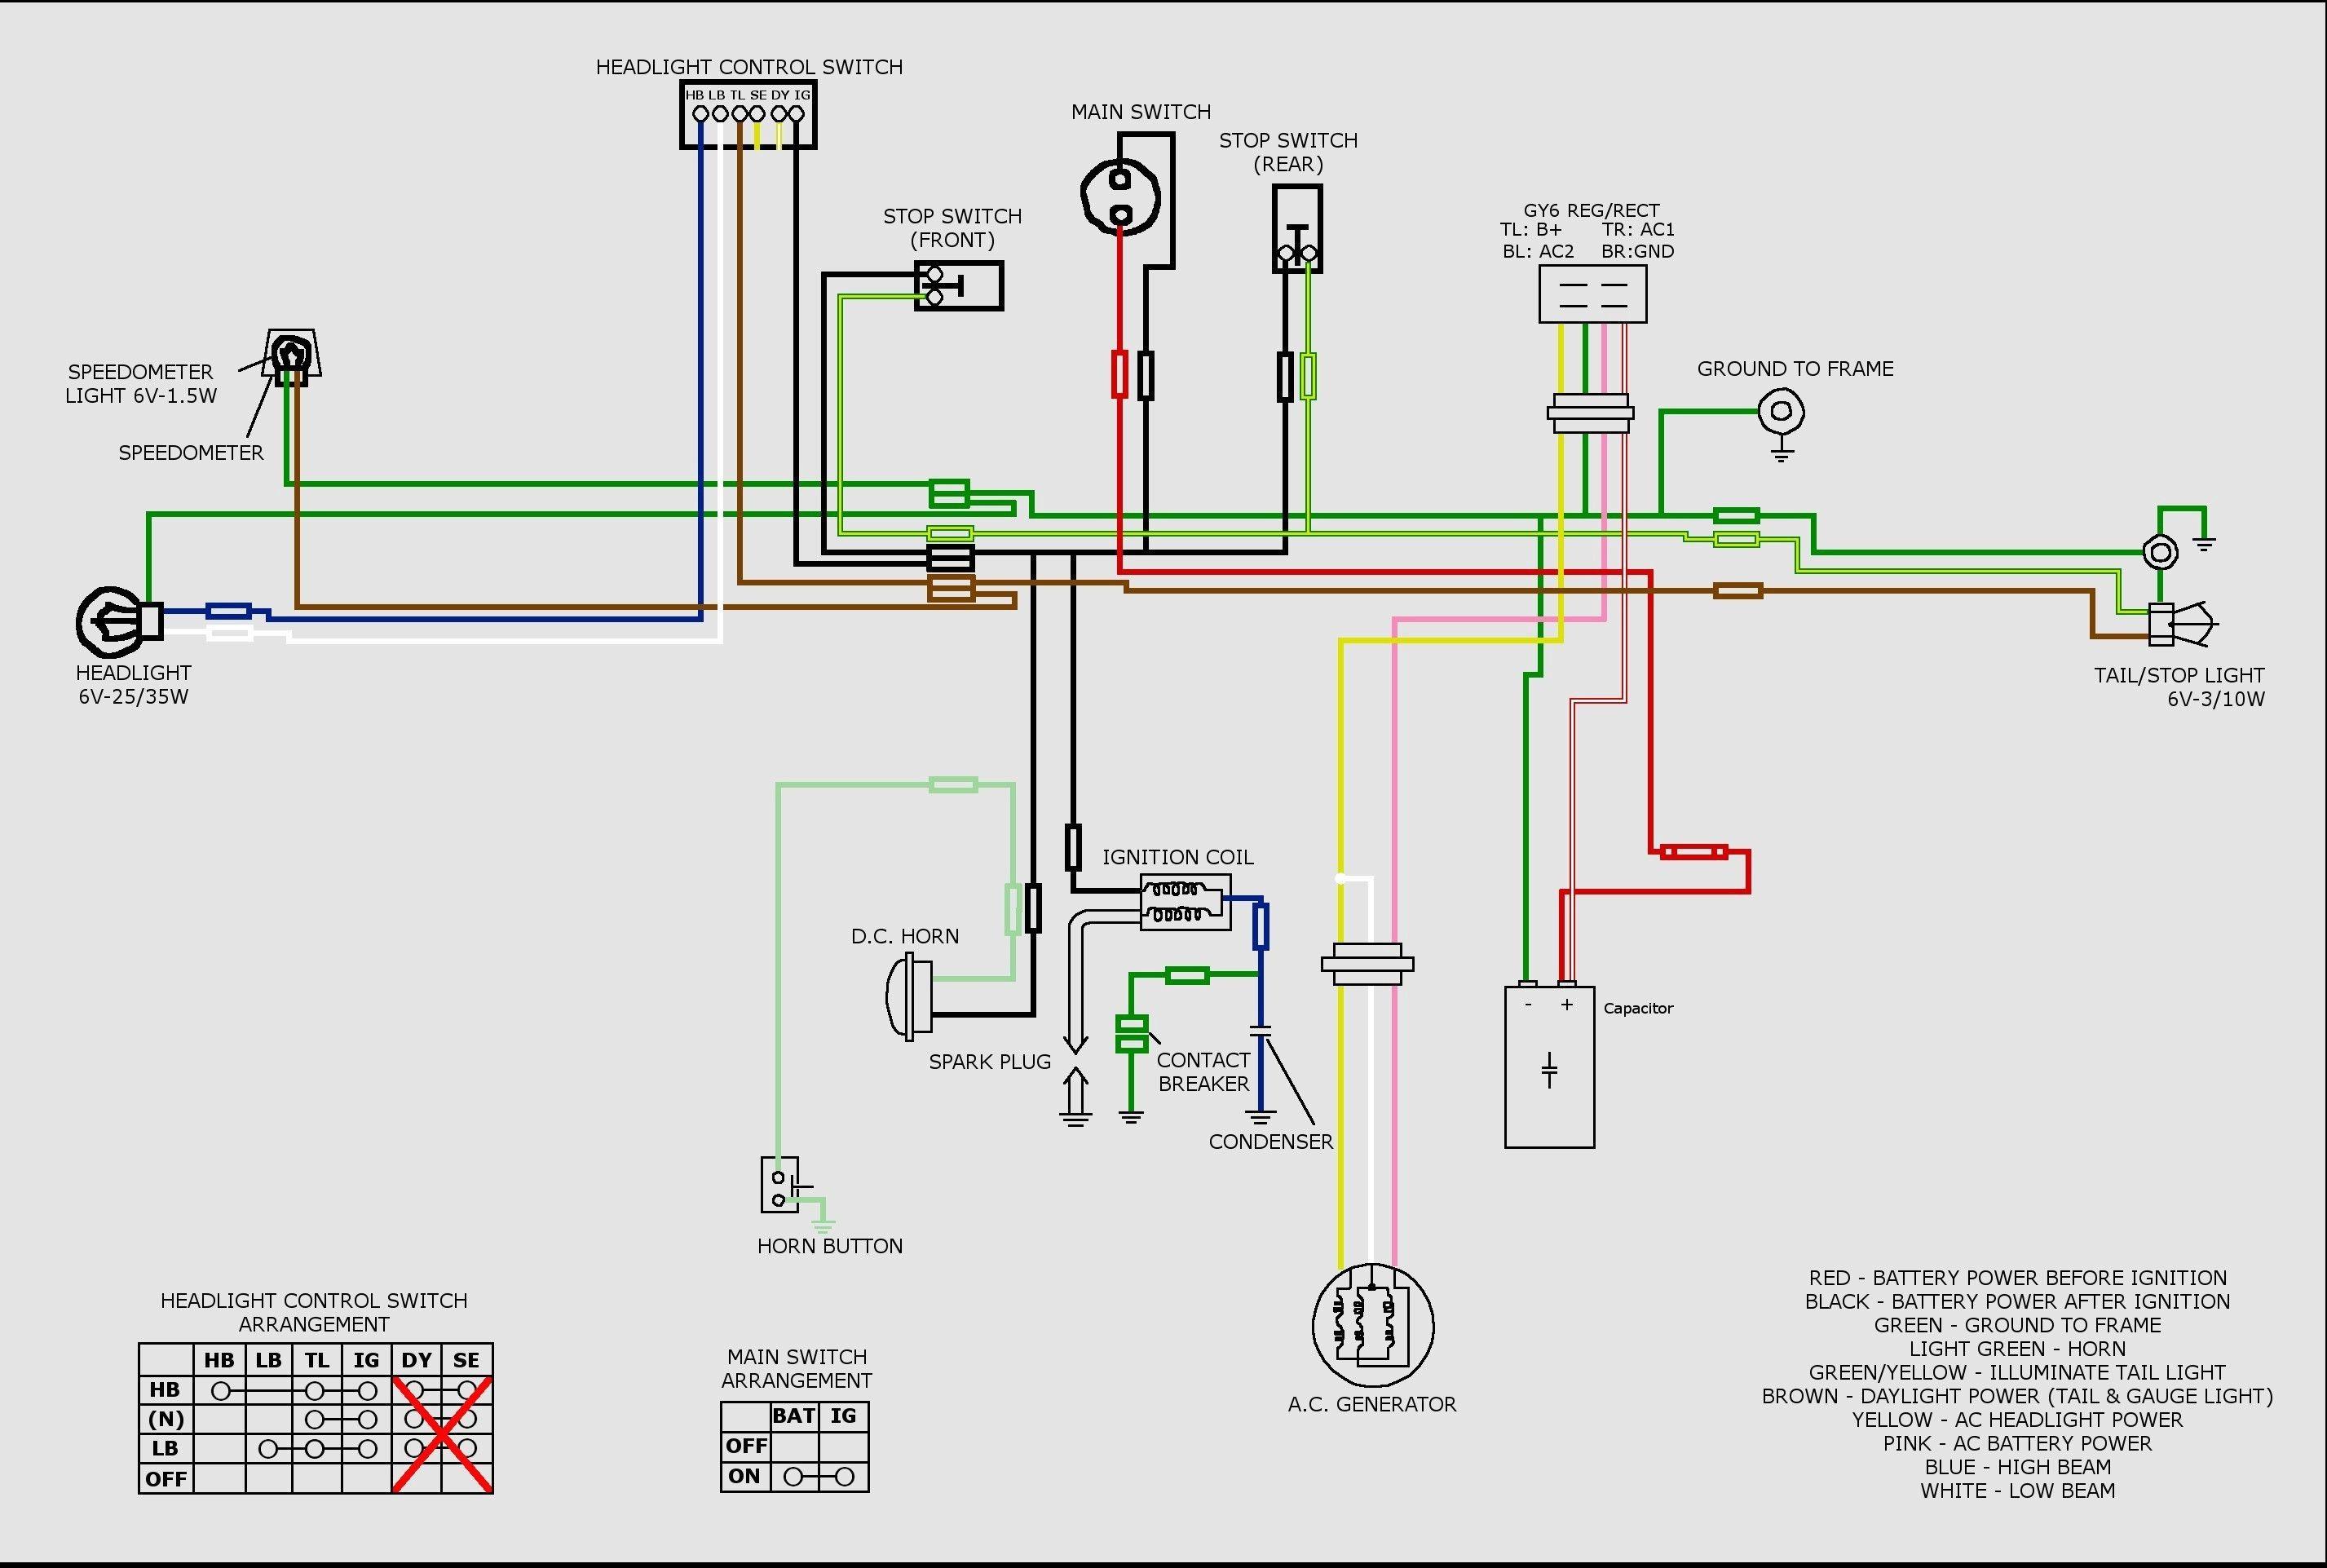 Atv Winch Wiring Diagram Gy6 Wiring Diagram Awesome 150cc Gy6 Wiring Diagram within Of Atv Winch Wiring Diagram